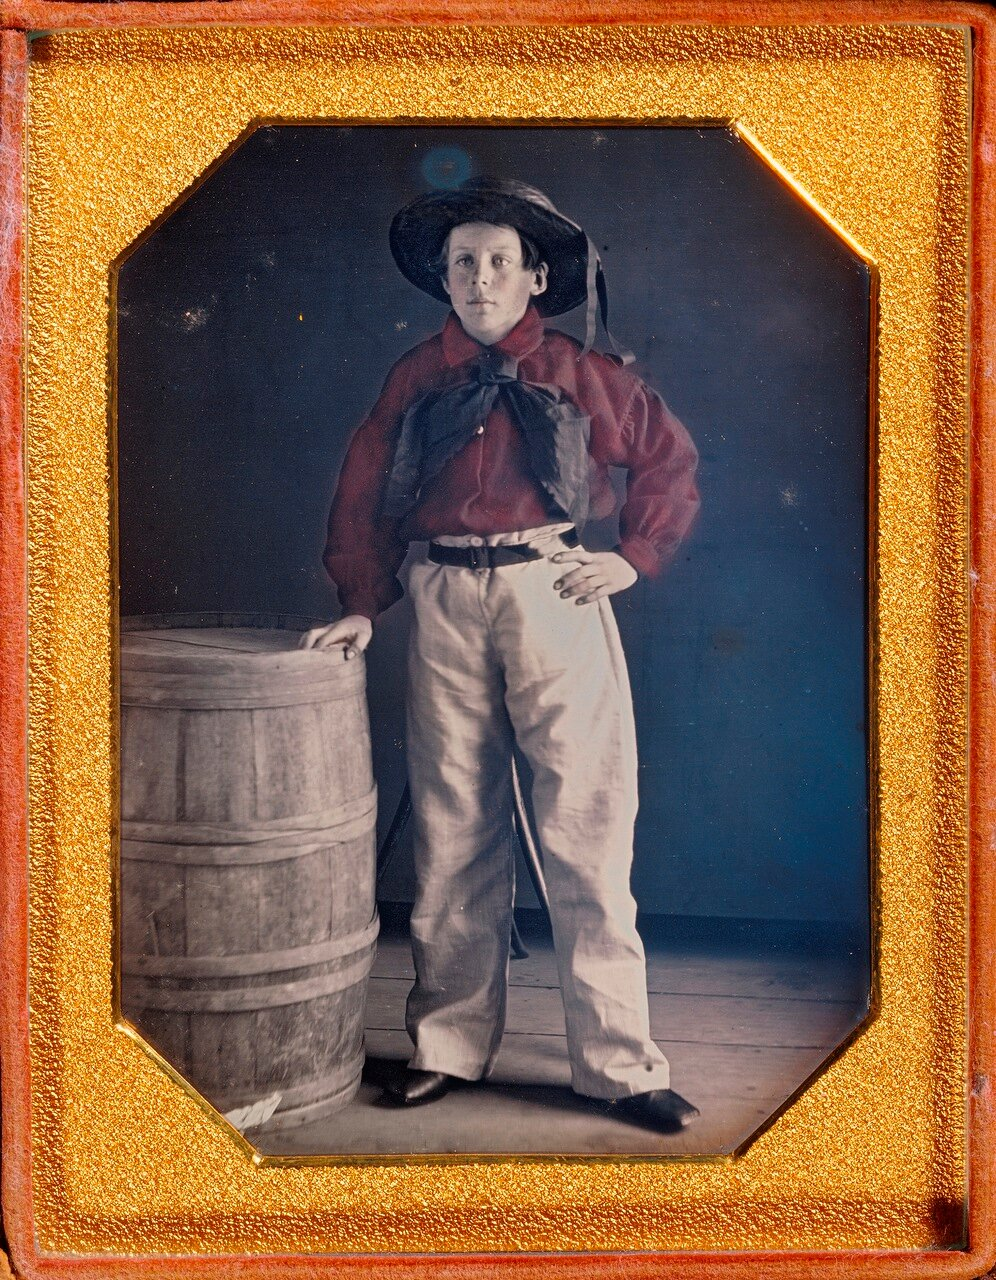 1848. Портрет молодого моряка. США.